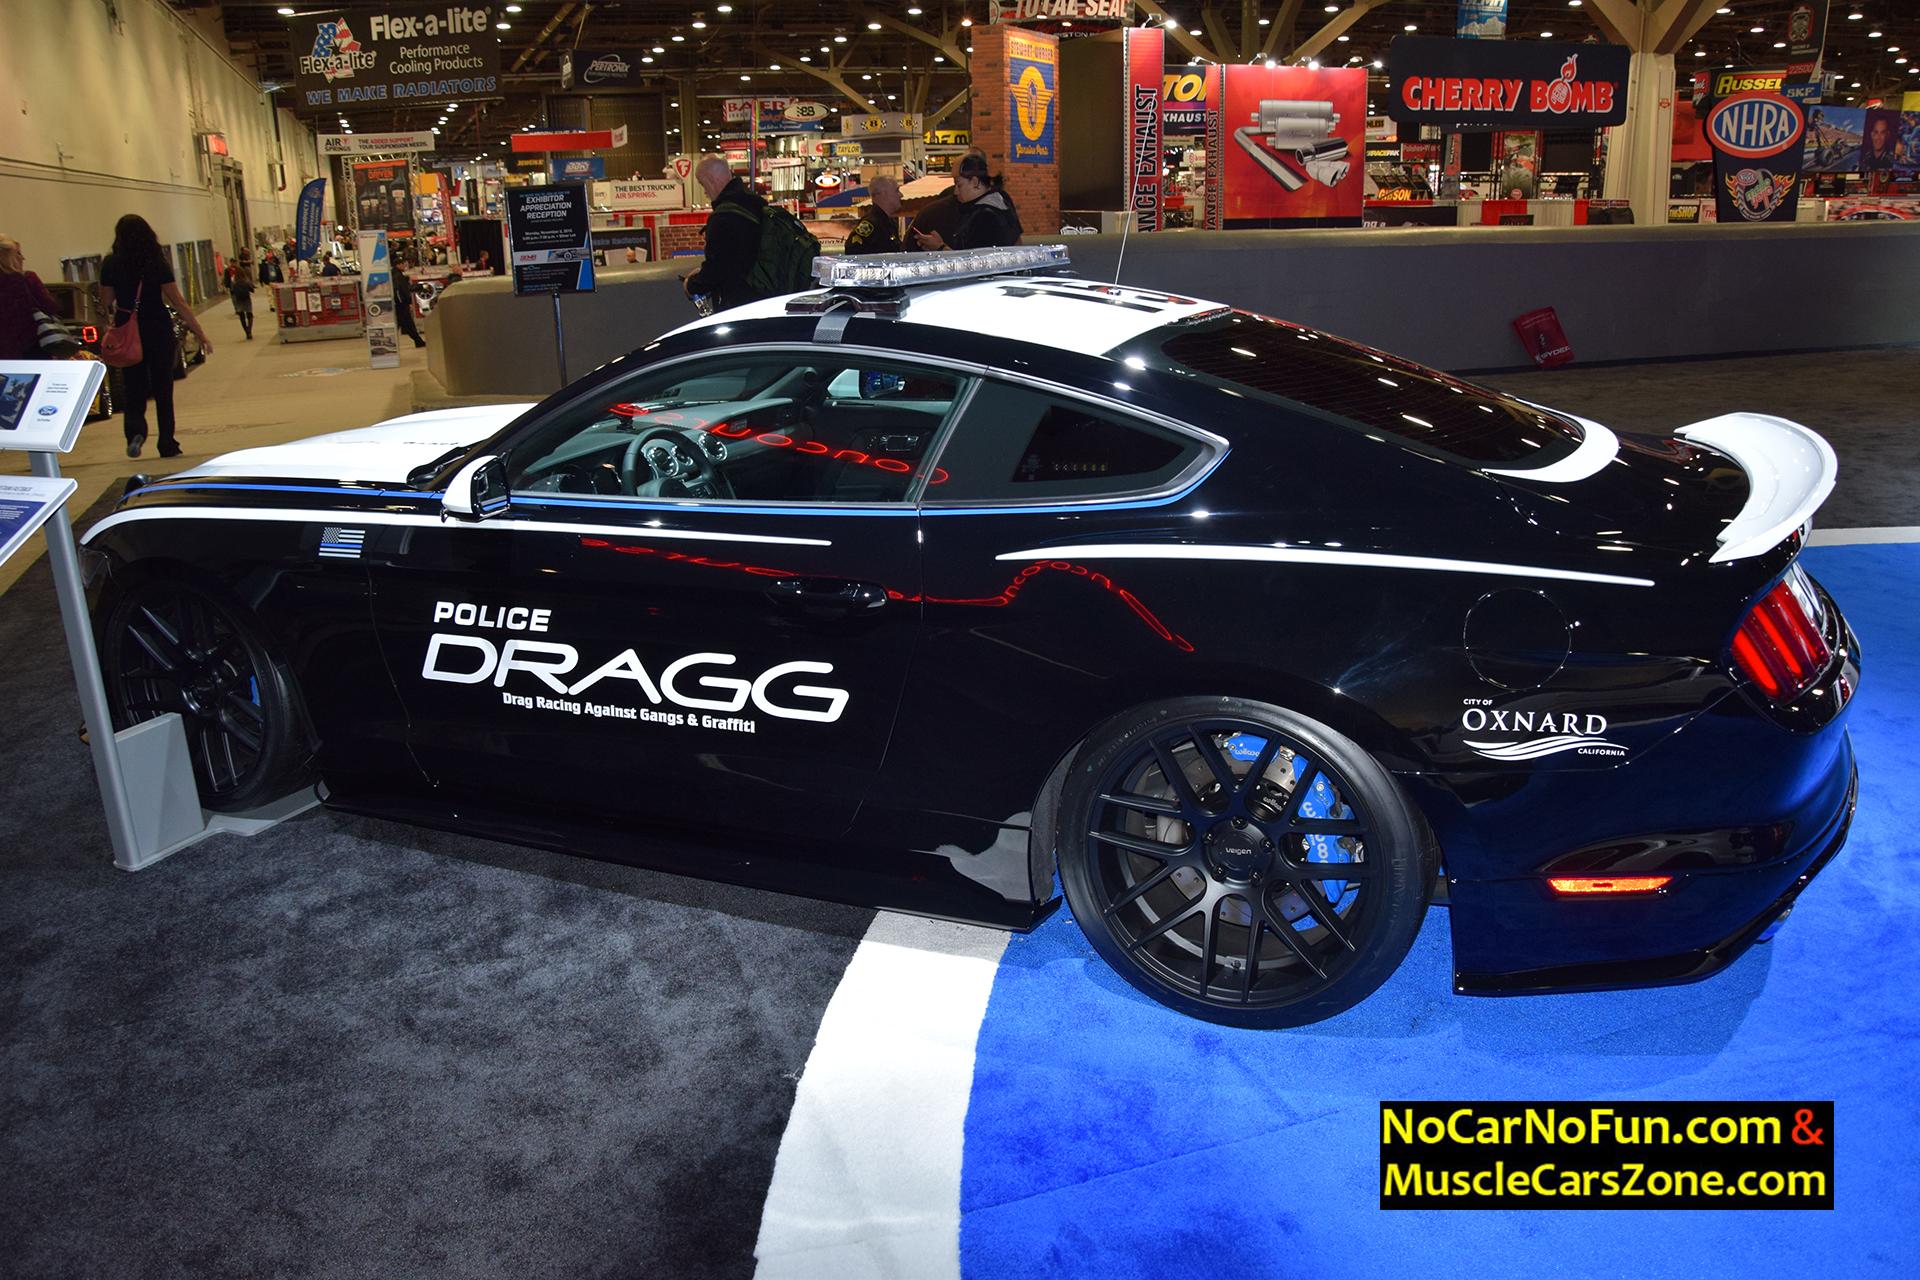 Ford Mustang Police Car DRAGG Oxnard SEMA Motor Show - Oxnard car show